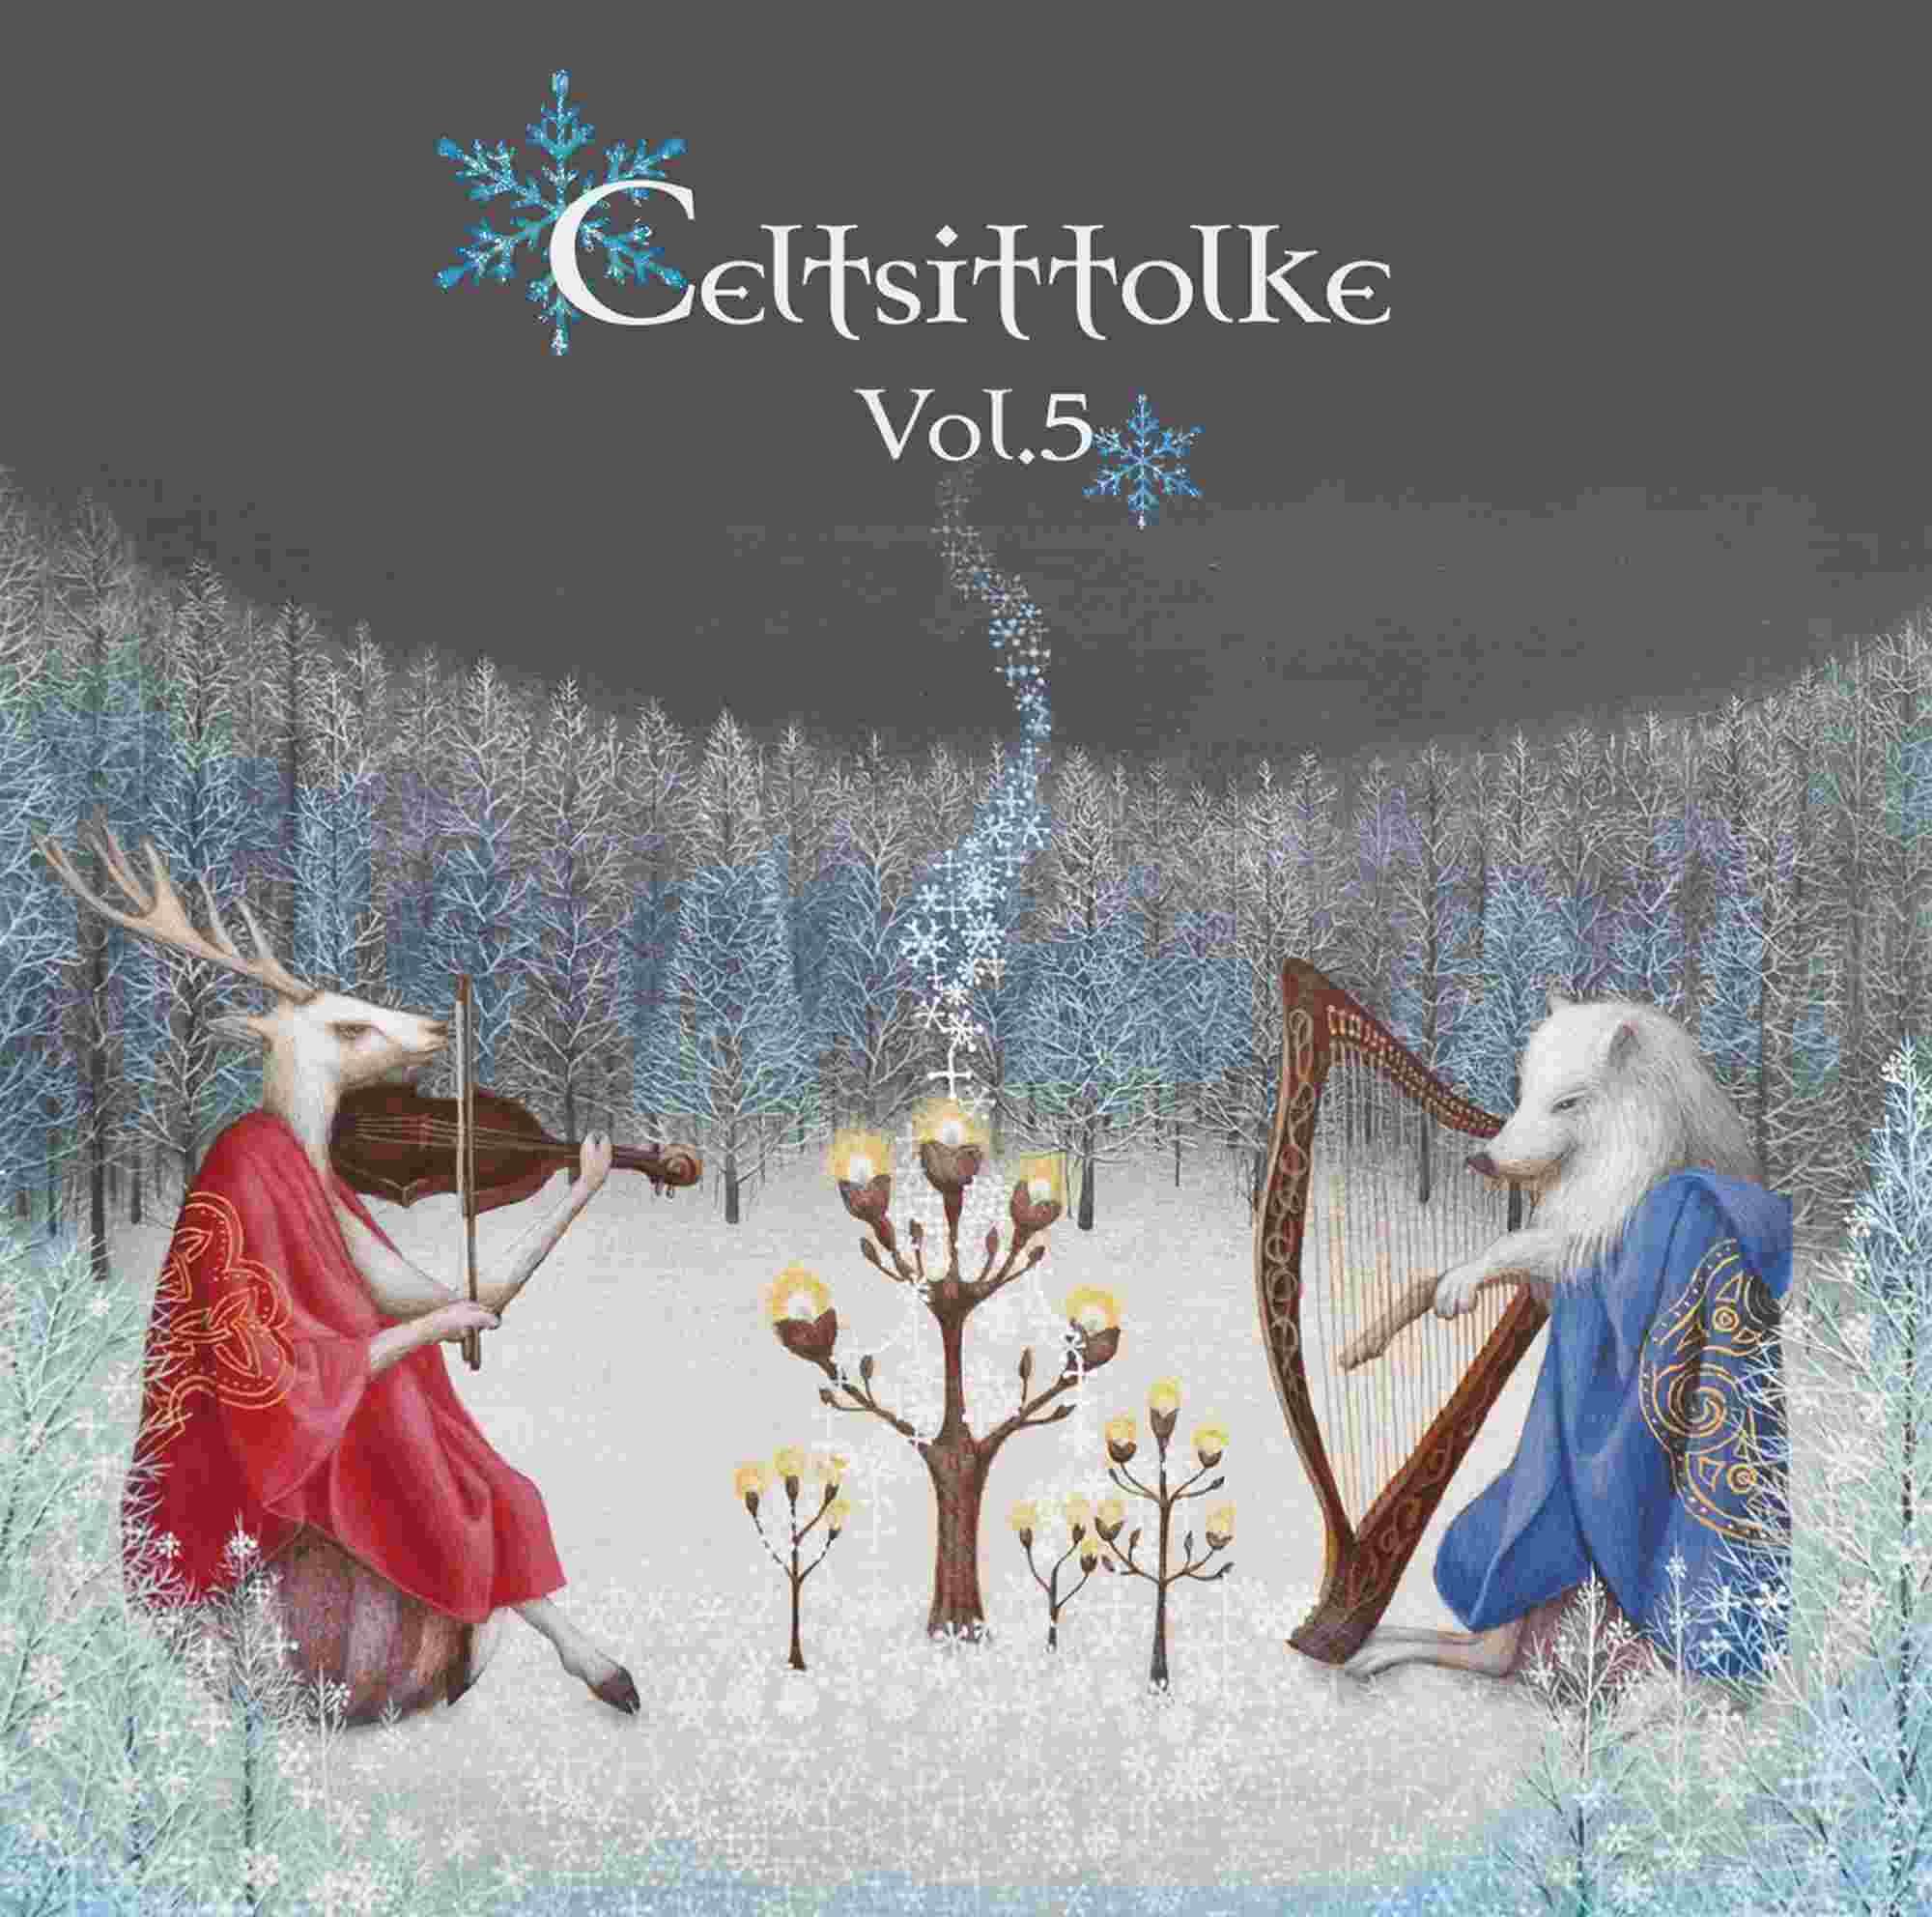 2017/03/25 CELTSITTOLKE Vol.5 ~関西ケルト/アイリッシュ・コンピレーションアルバム ご予約開始!!